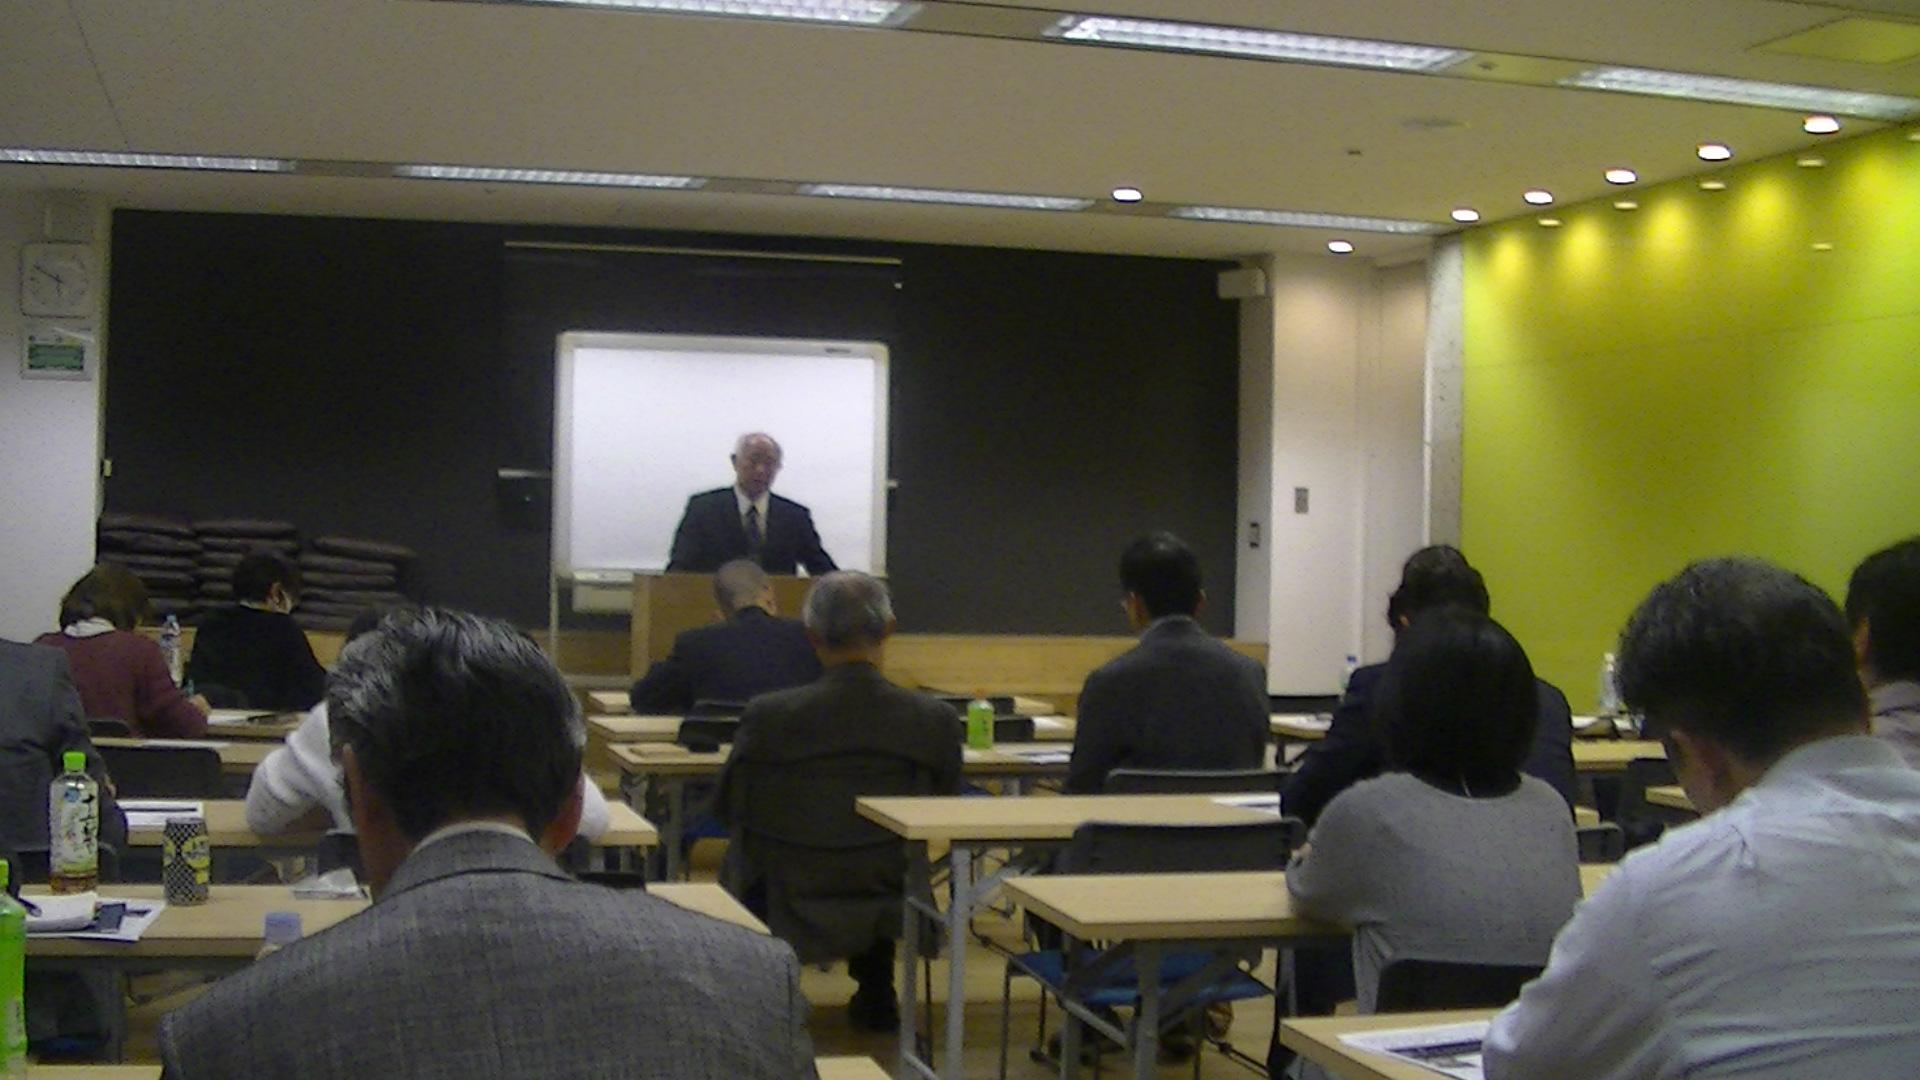 PIC 0094 - 4月1日東京思風塾の開催になります。